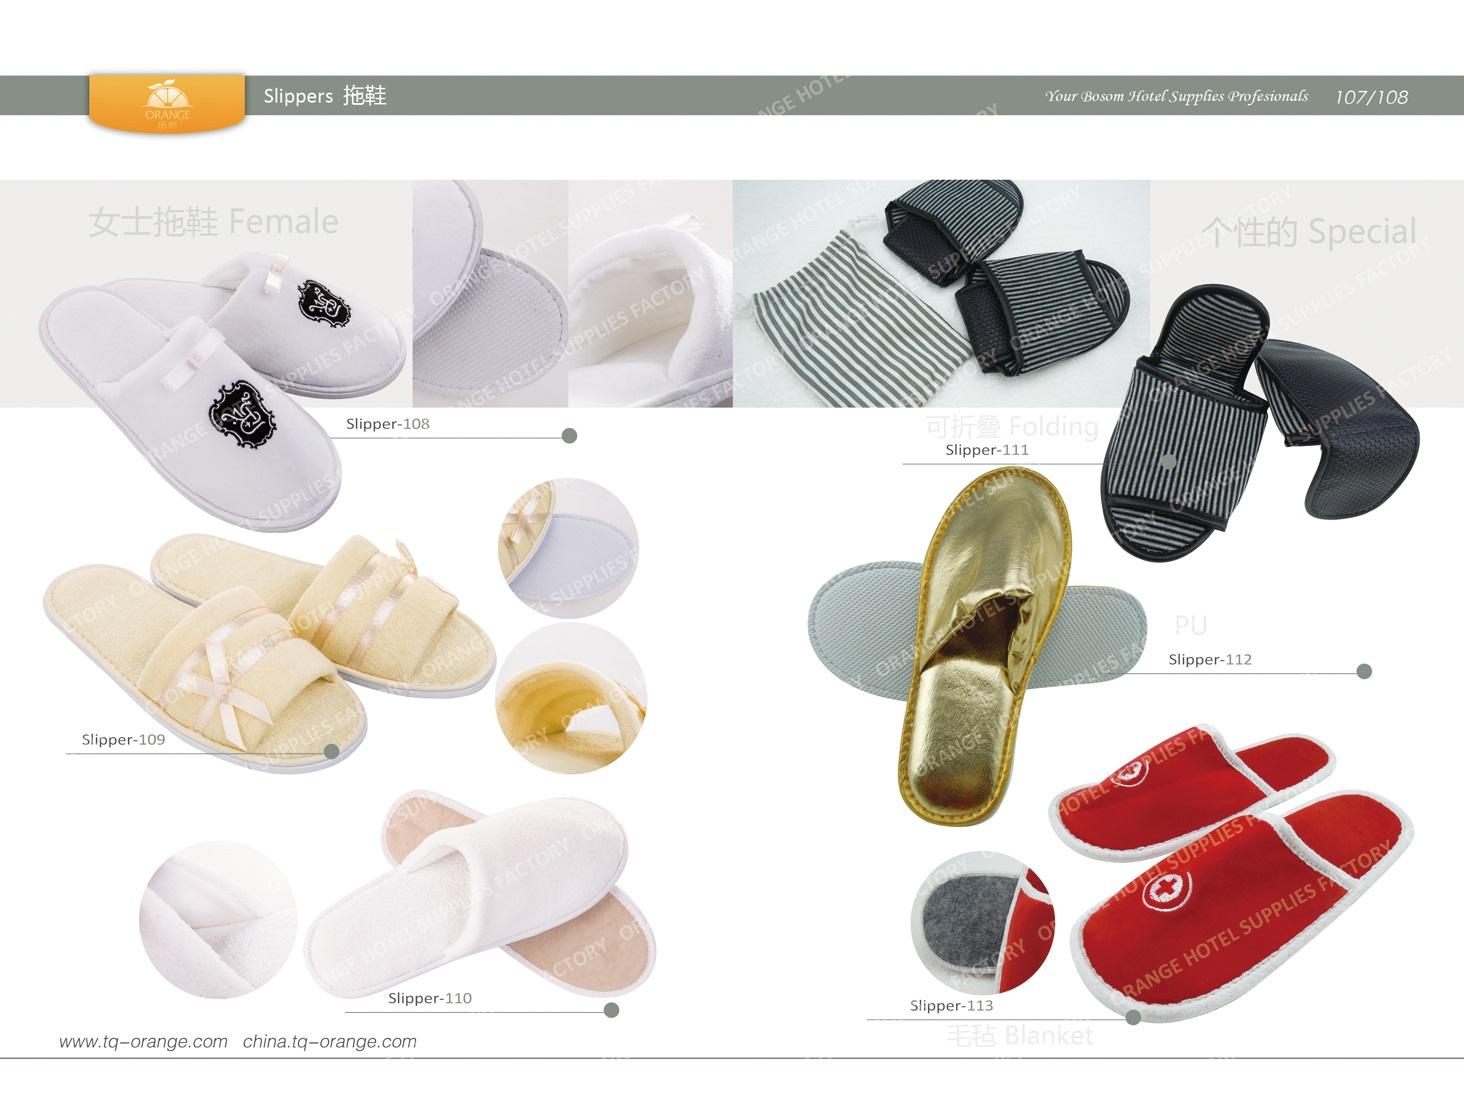 Hotel Female slippers, Folding slippers,PU slippers, Blanket Slippers